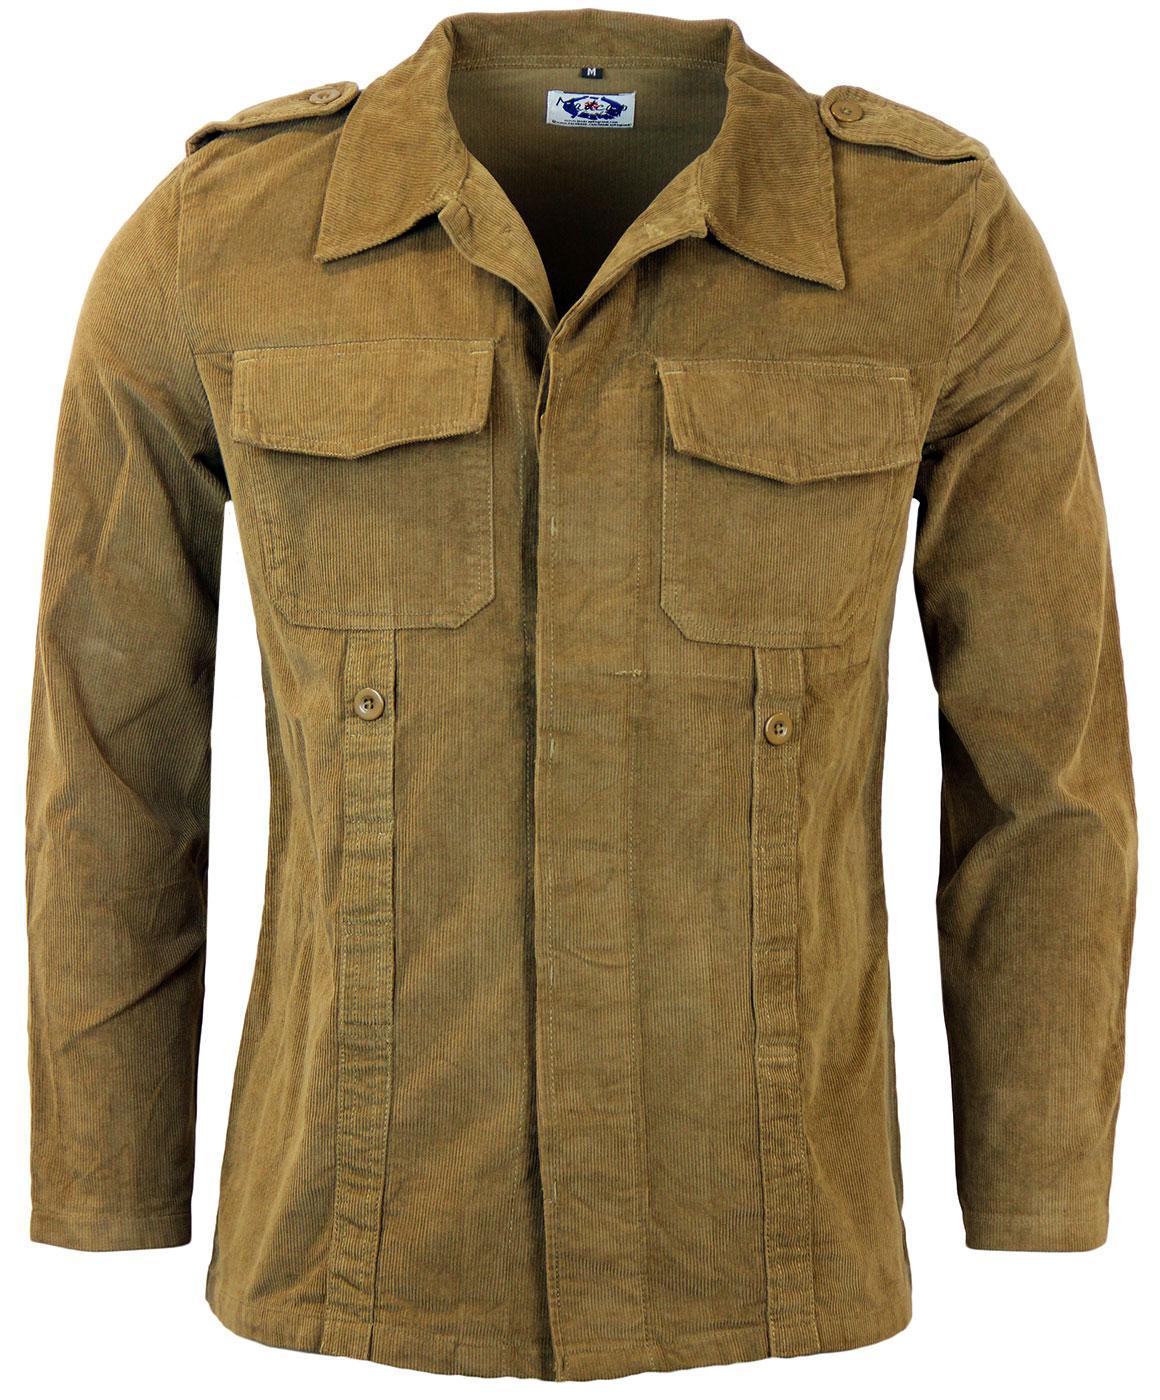 Original 60's green cord jacket s3ox9